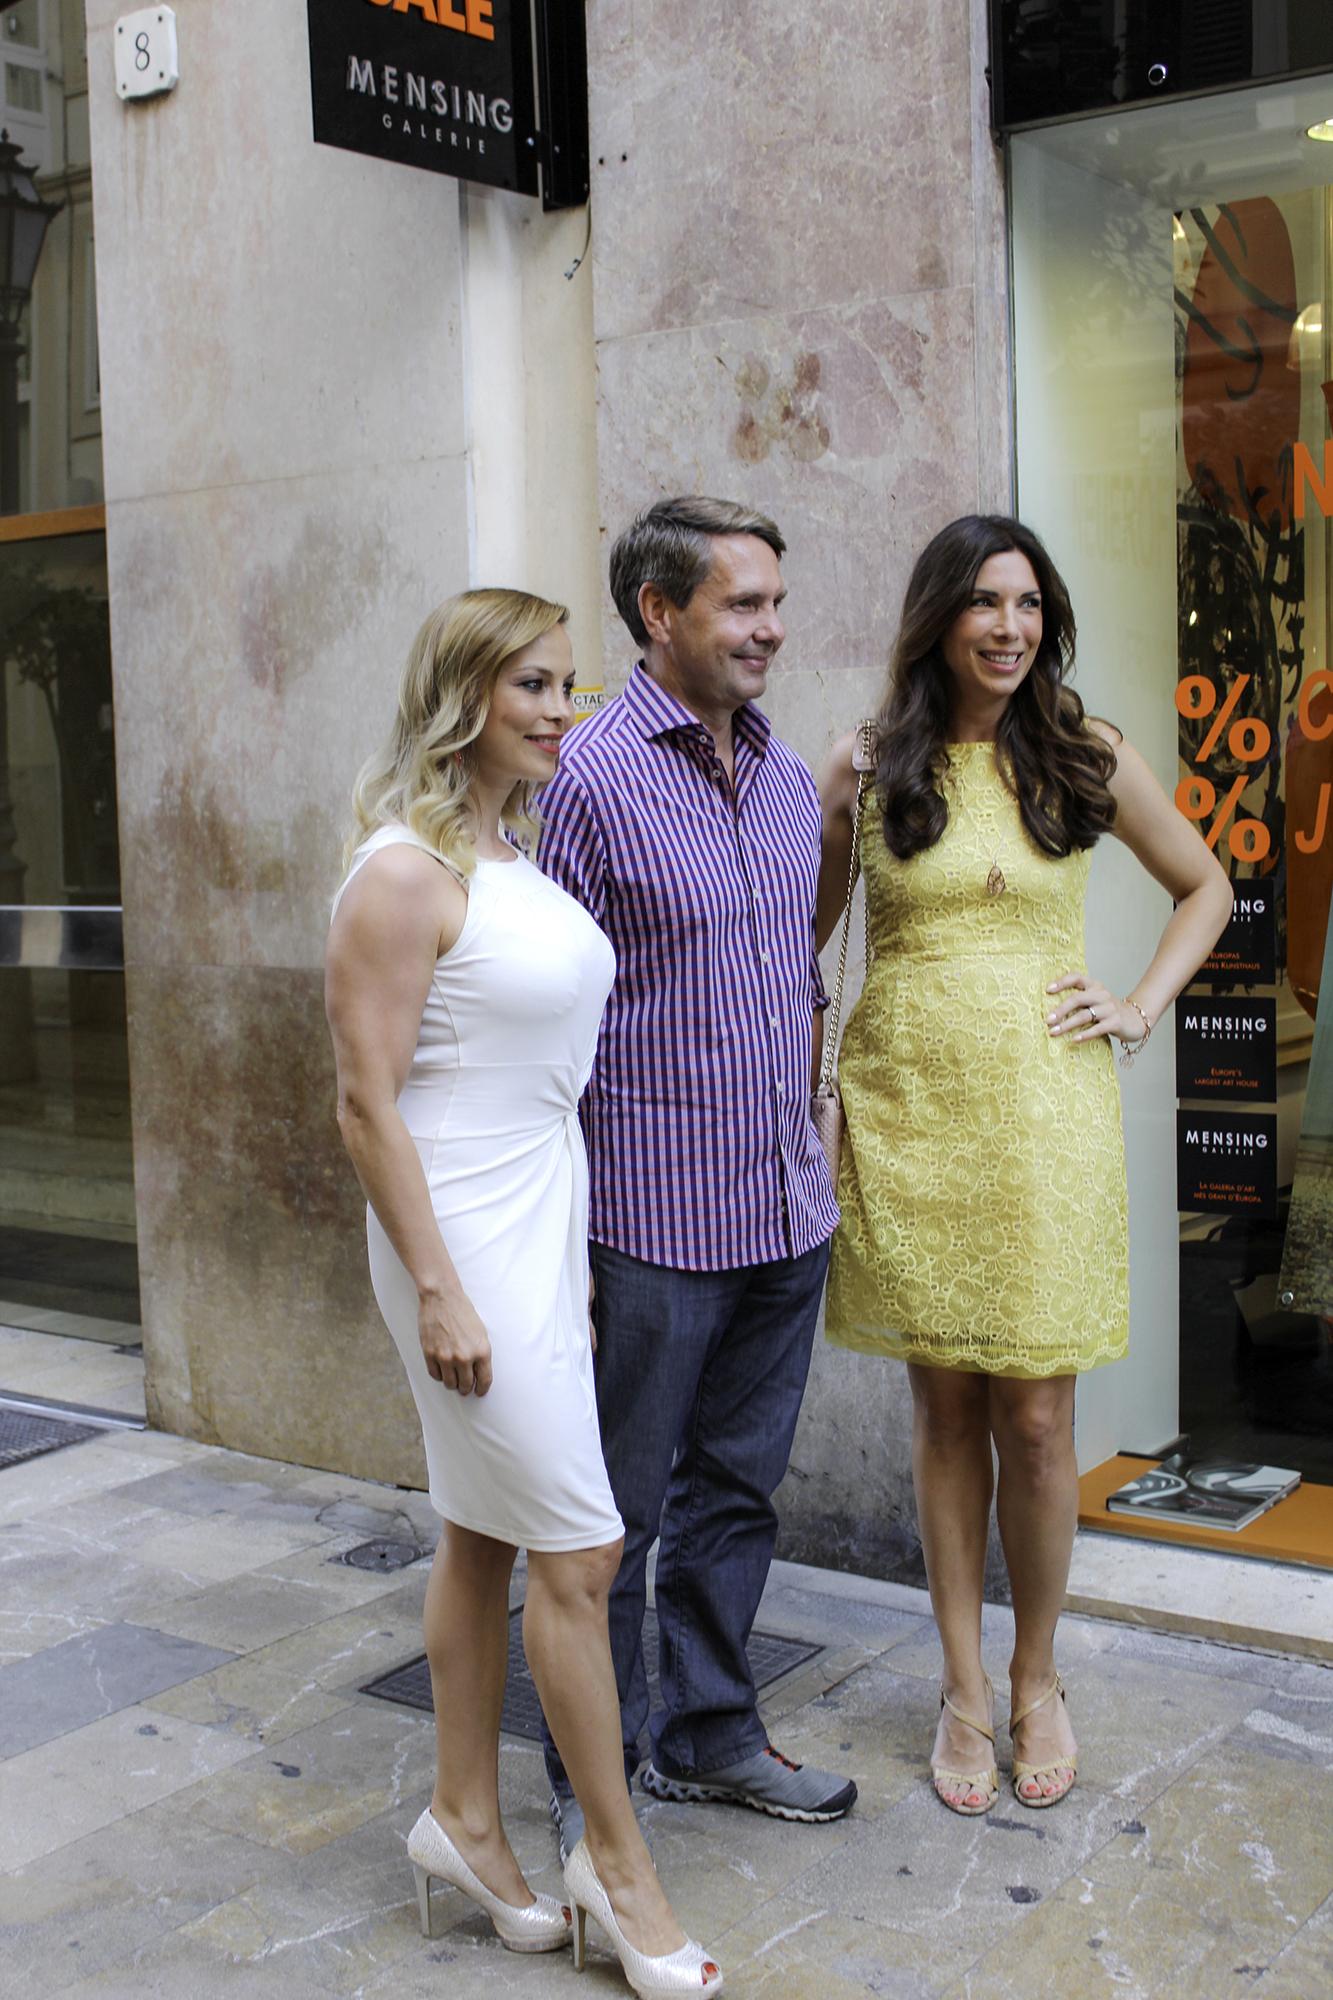 Harry Mensing mit Regina Halmich und Alexandra Polzin in Palma